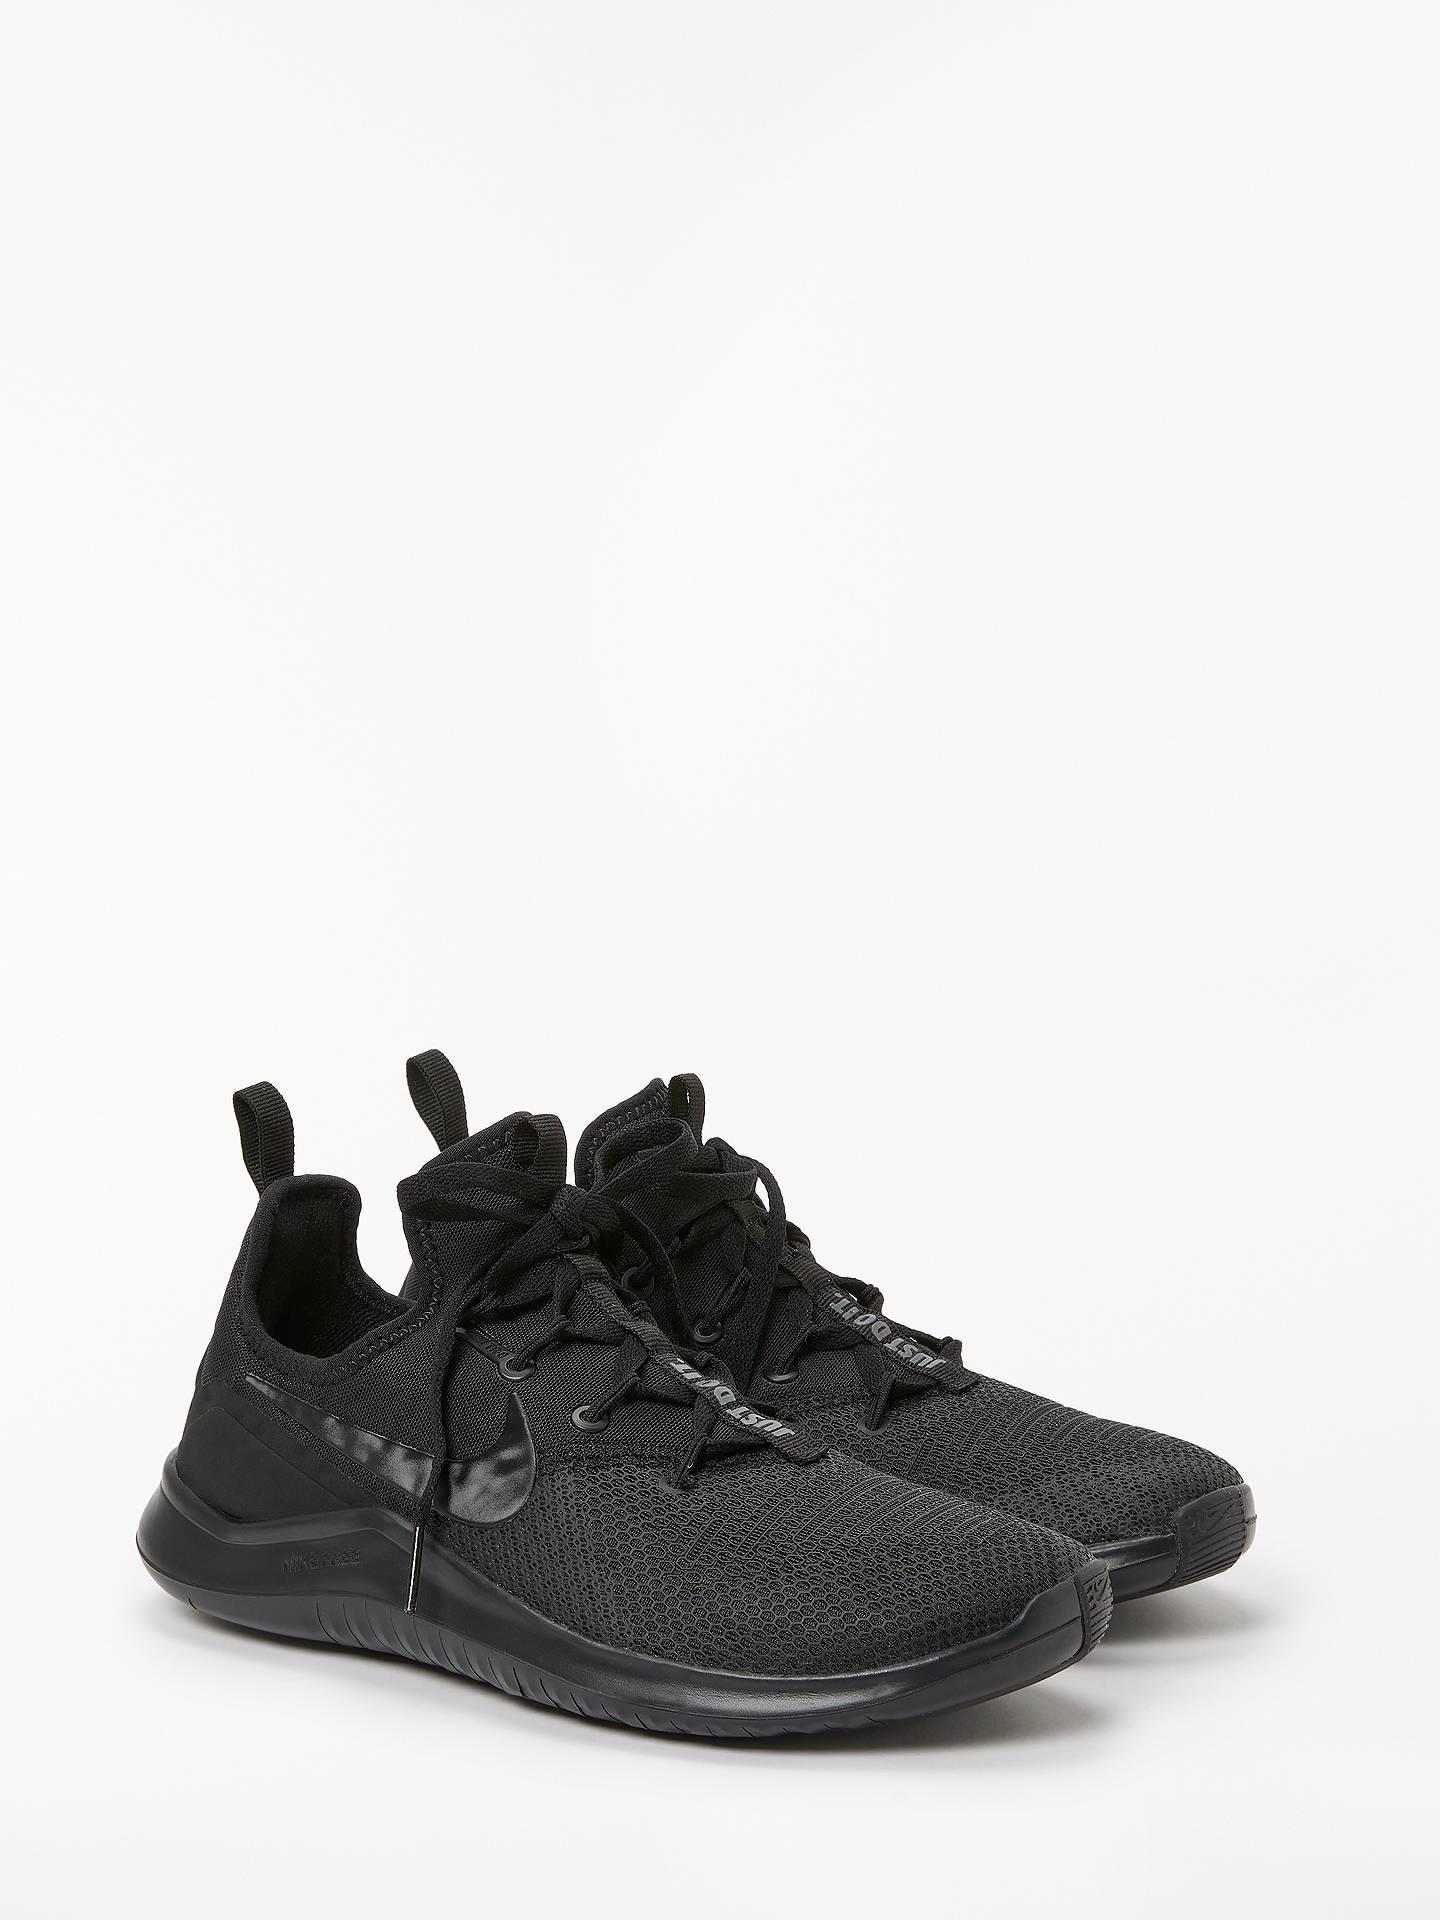 88bbefa48170 Buy Nike Free TR 8 Women s Training Shoes